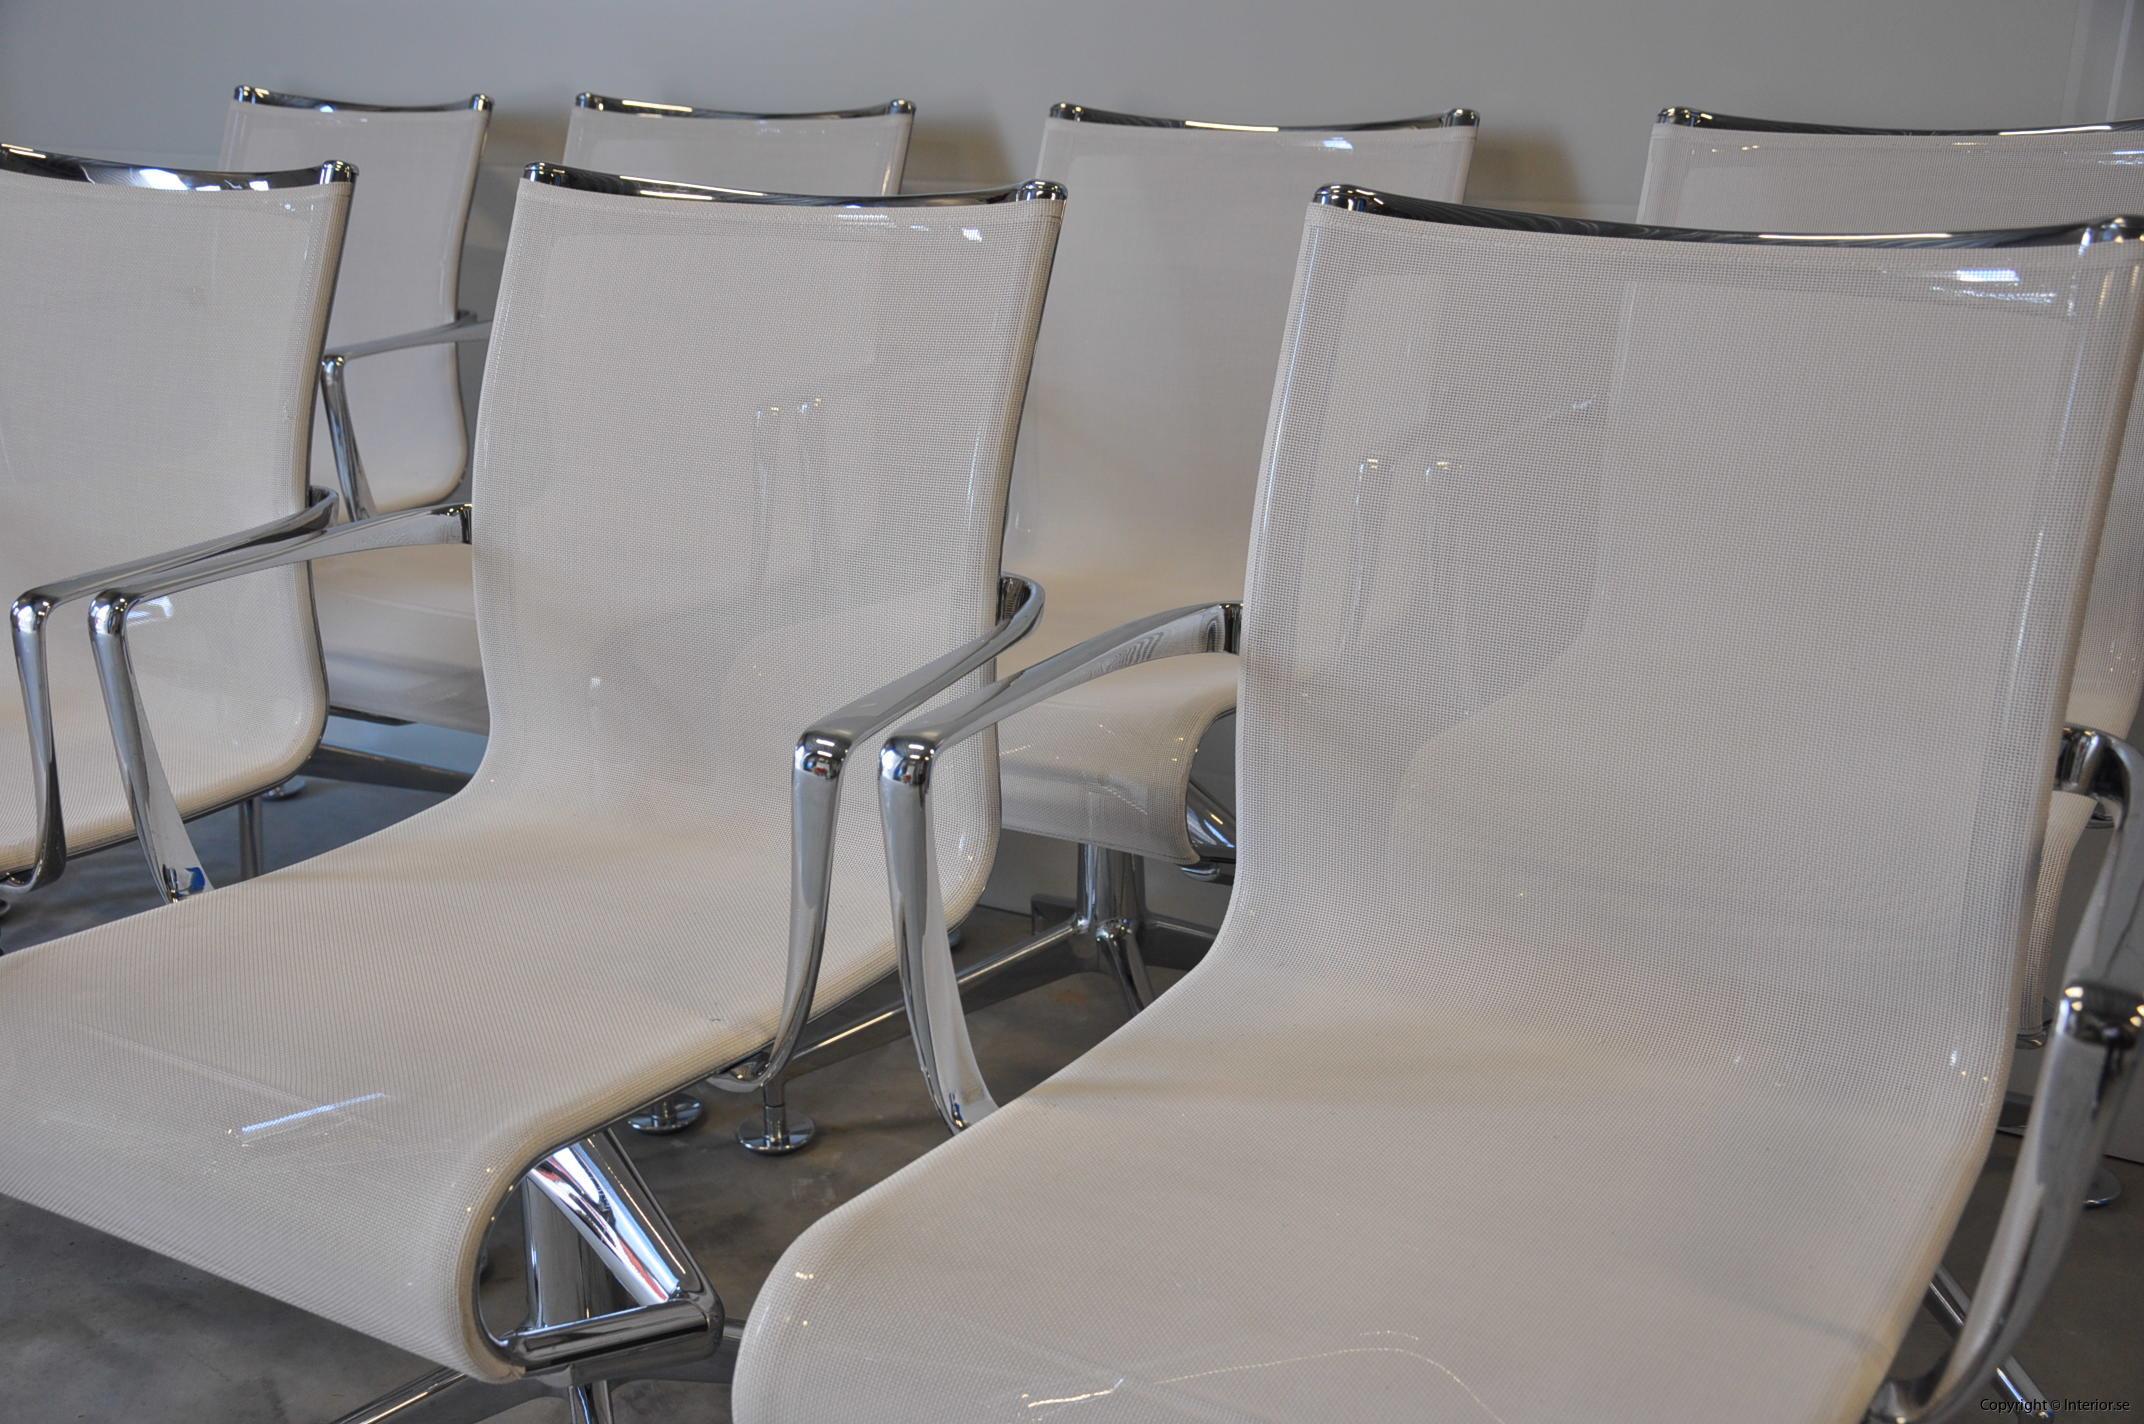 Konferensstolar, Alias Meetingframe 437 Alberto Meda conference chair konferenzstuhle (6)